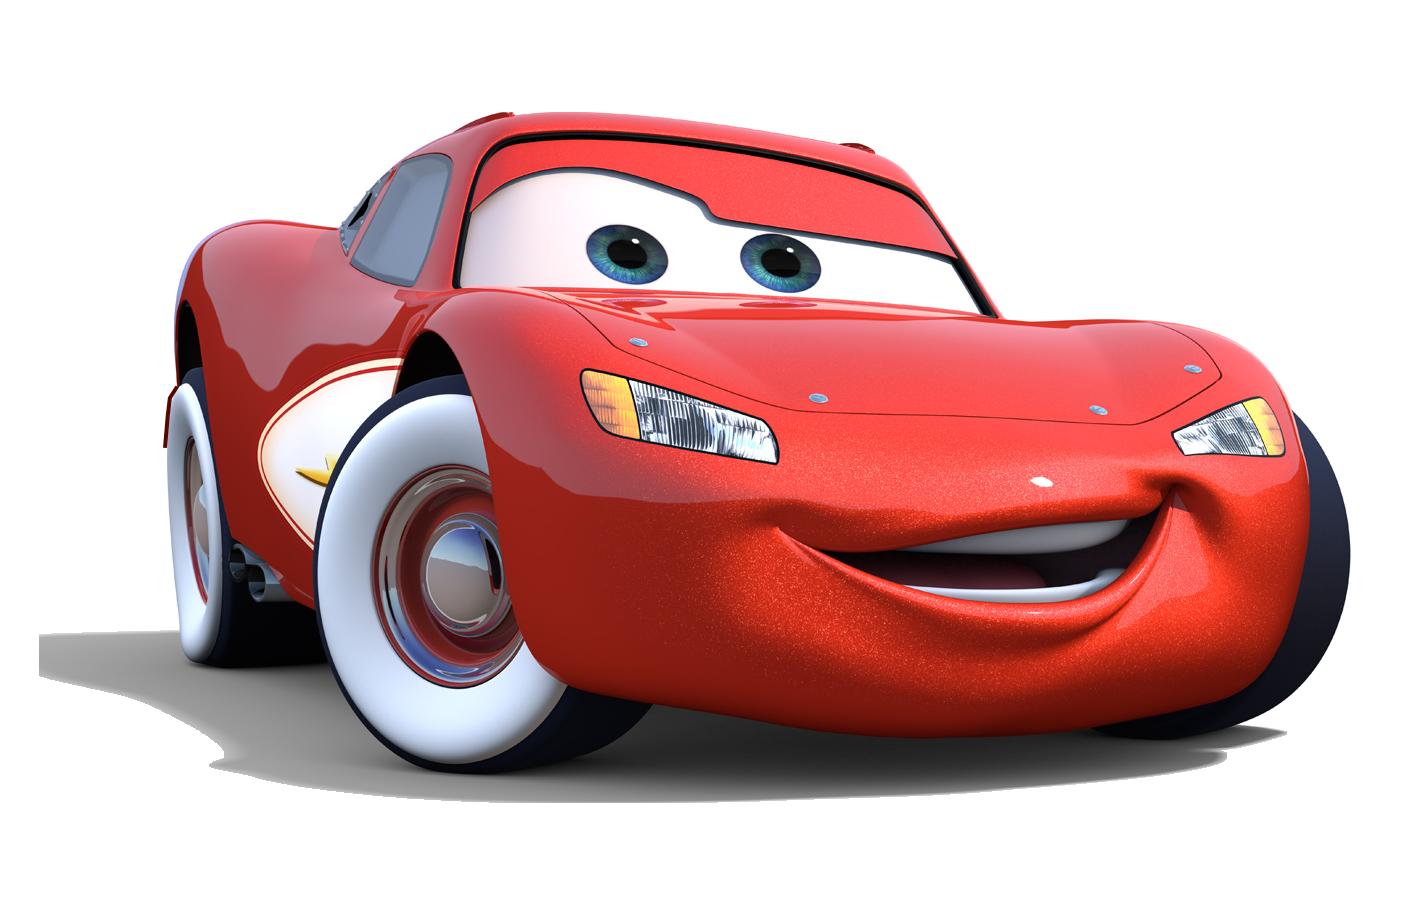 Short girl car sun visor clipart banner library download carros desenho - Pesquisa Google | Carros | Pinterest | Lightning ... banner library download